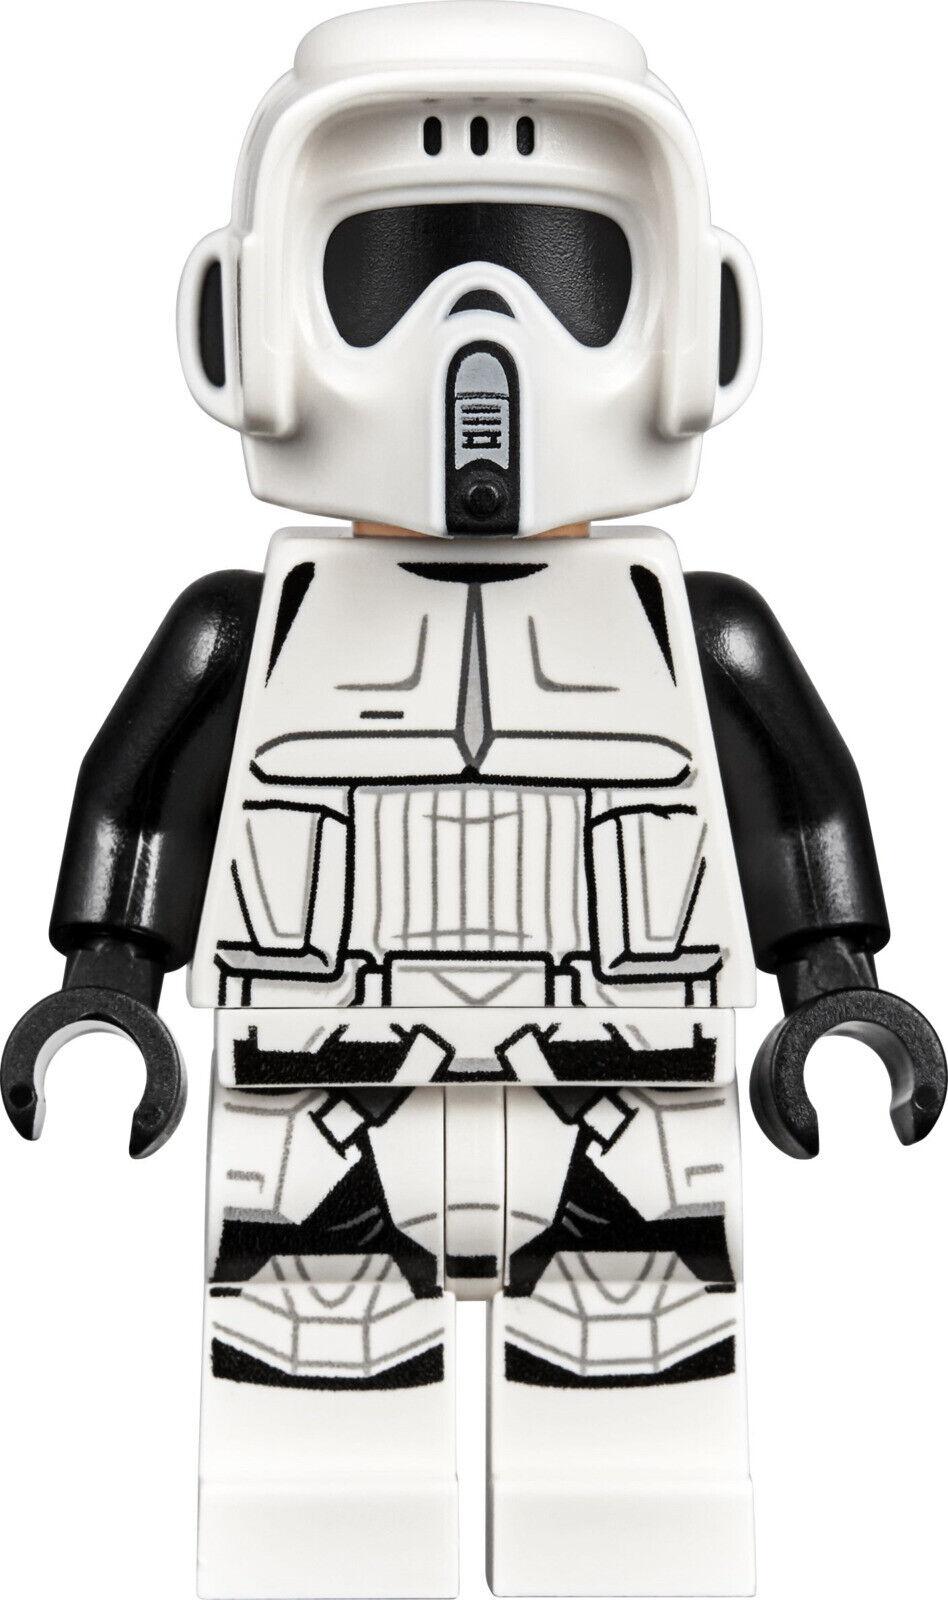 NEW Custom Minifigure Star Wars Clone Wars Scout Trooper ARRIVES IN 2-4 DAYS